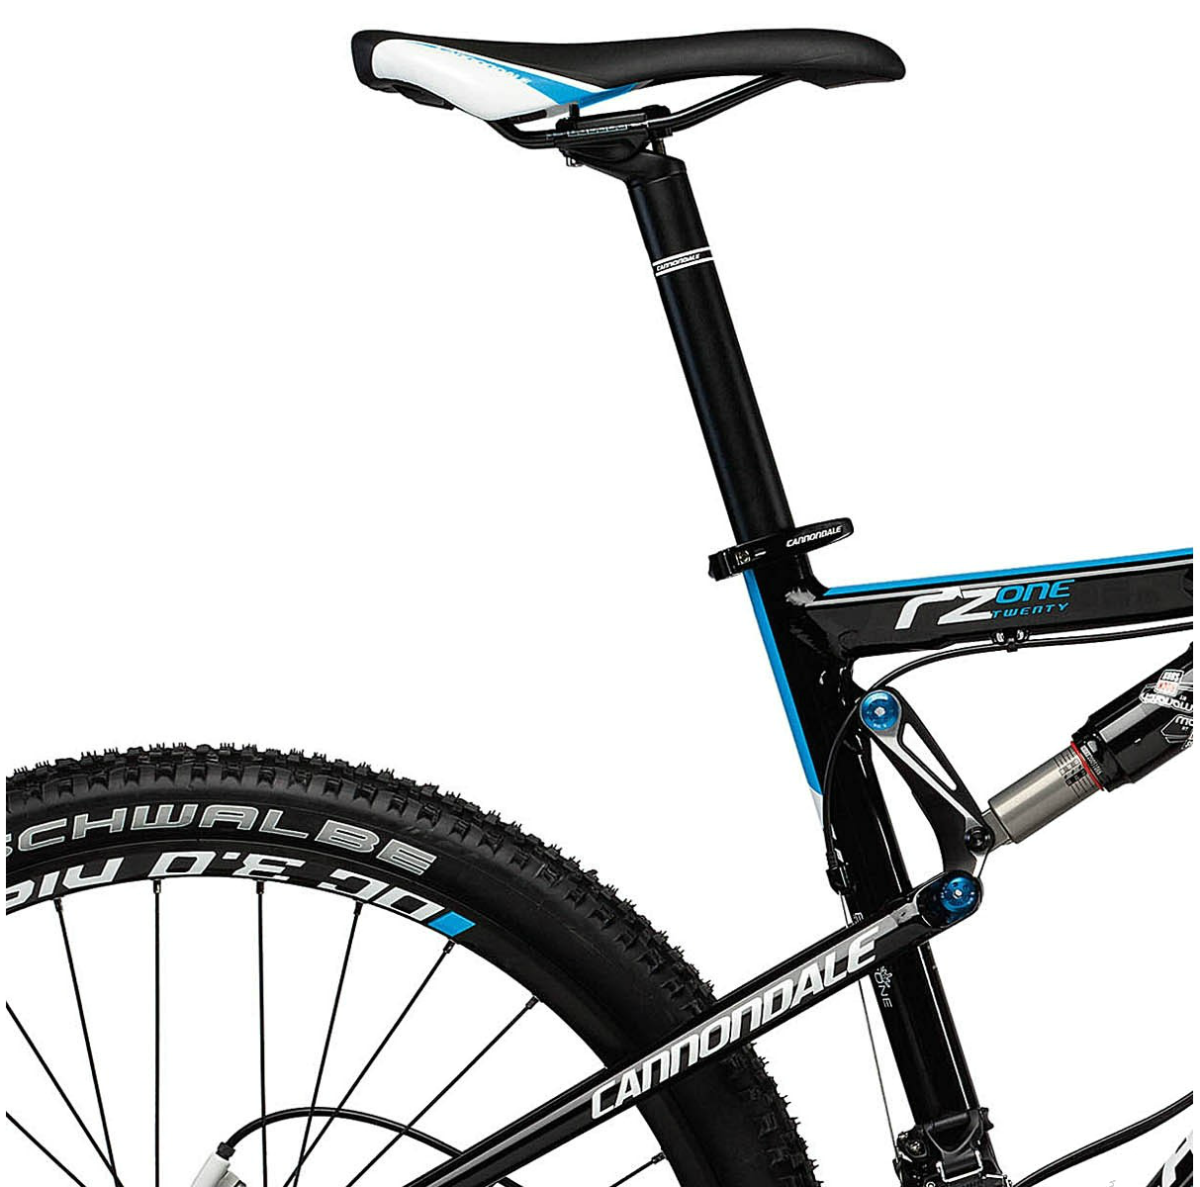 DesignApplause Cannondale Rz 120 1 Mountain Bike